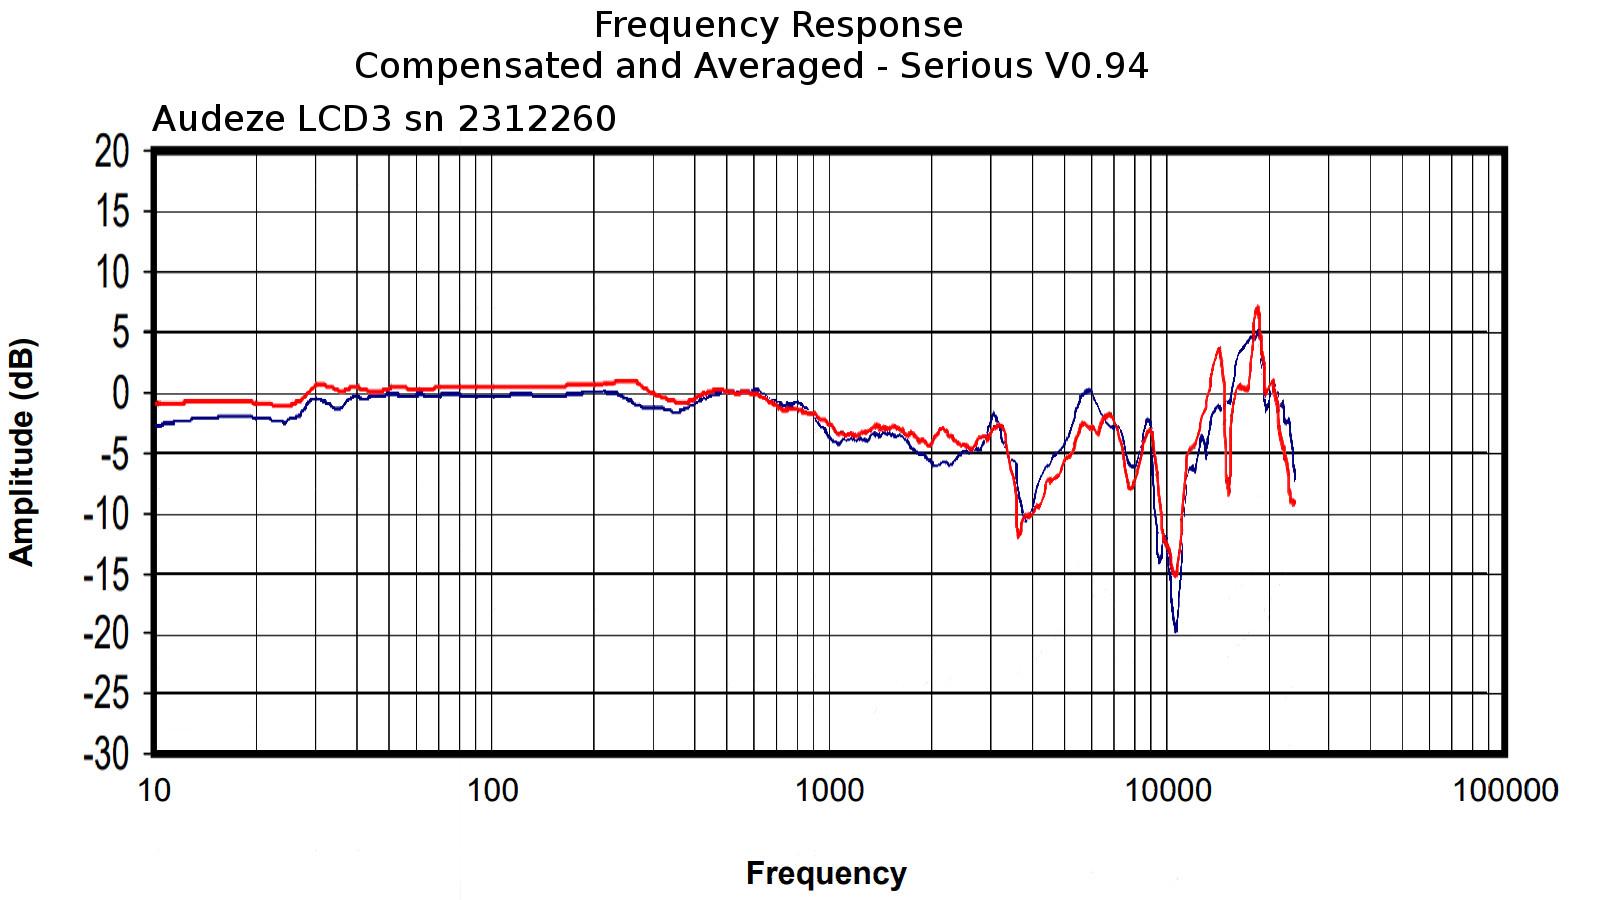 Audeze LCD3 sn 2312260.jpg